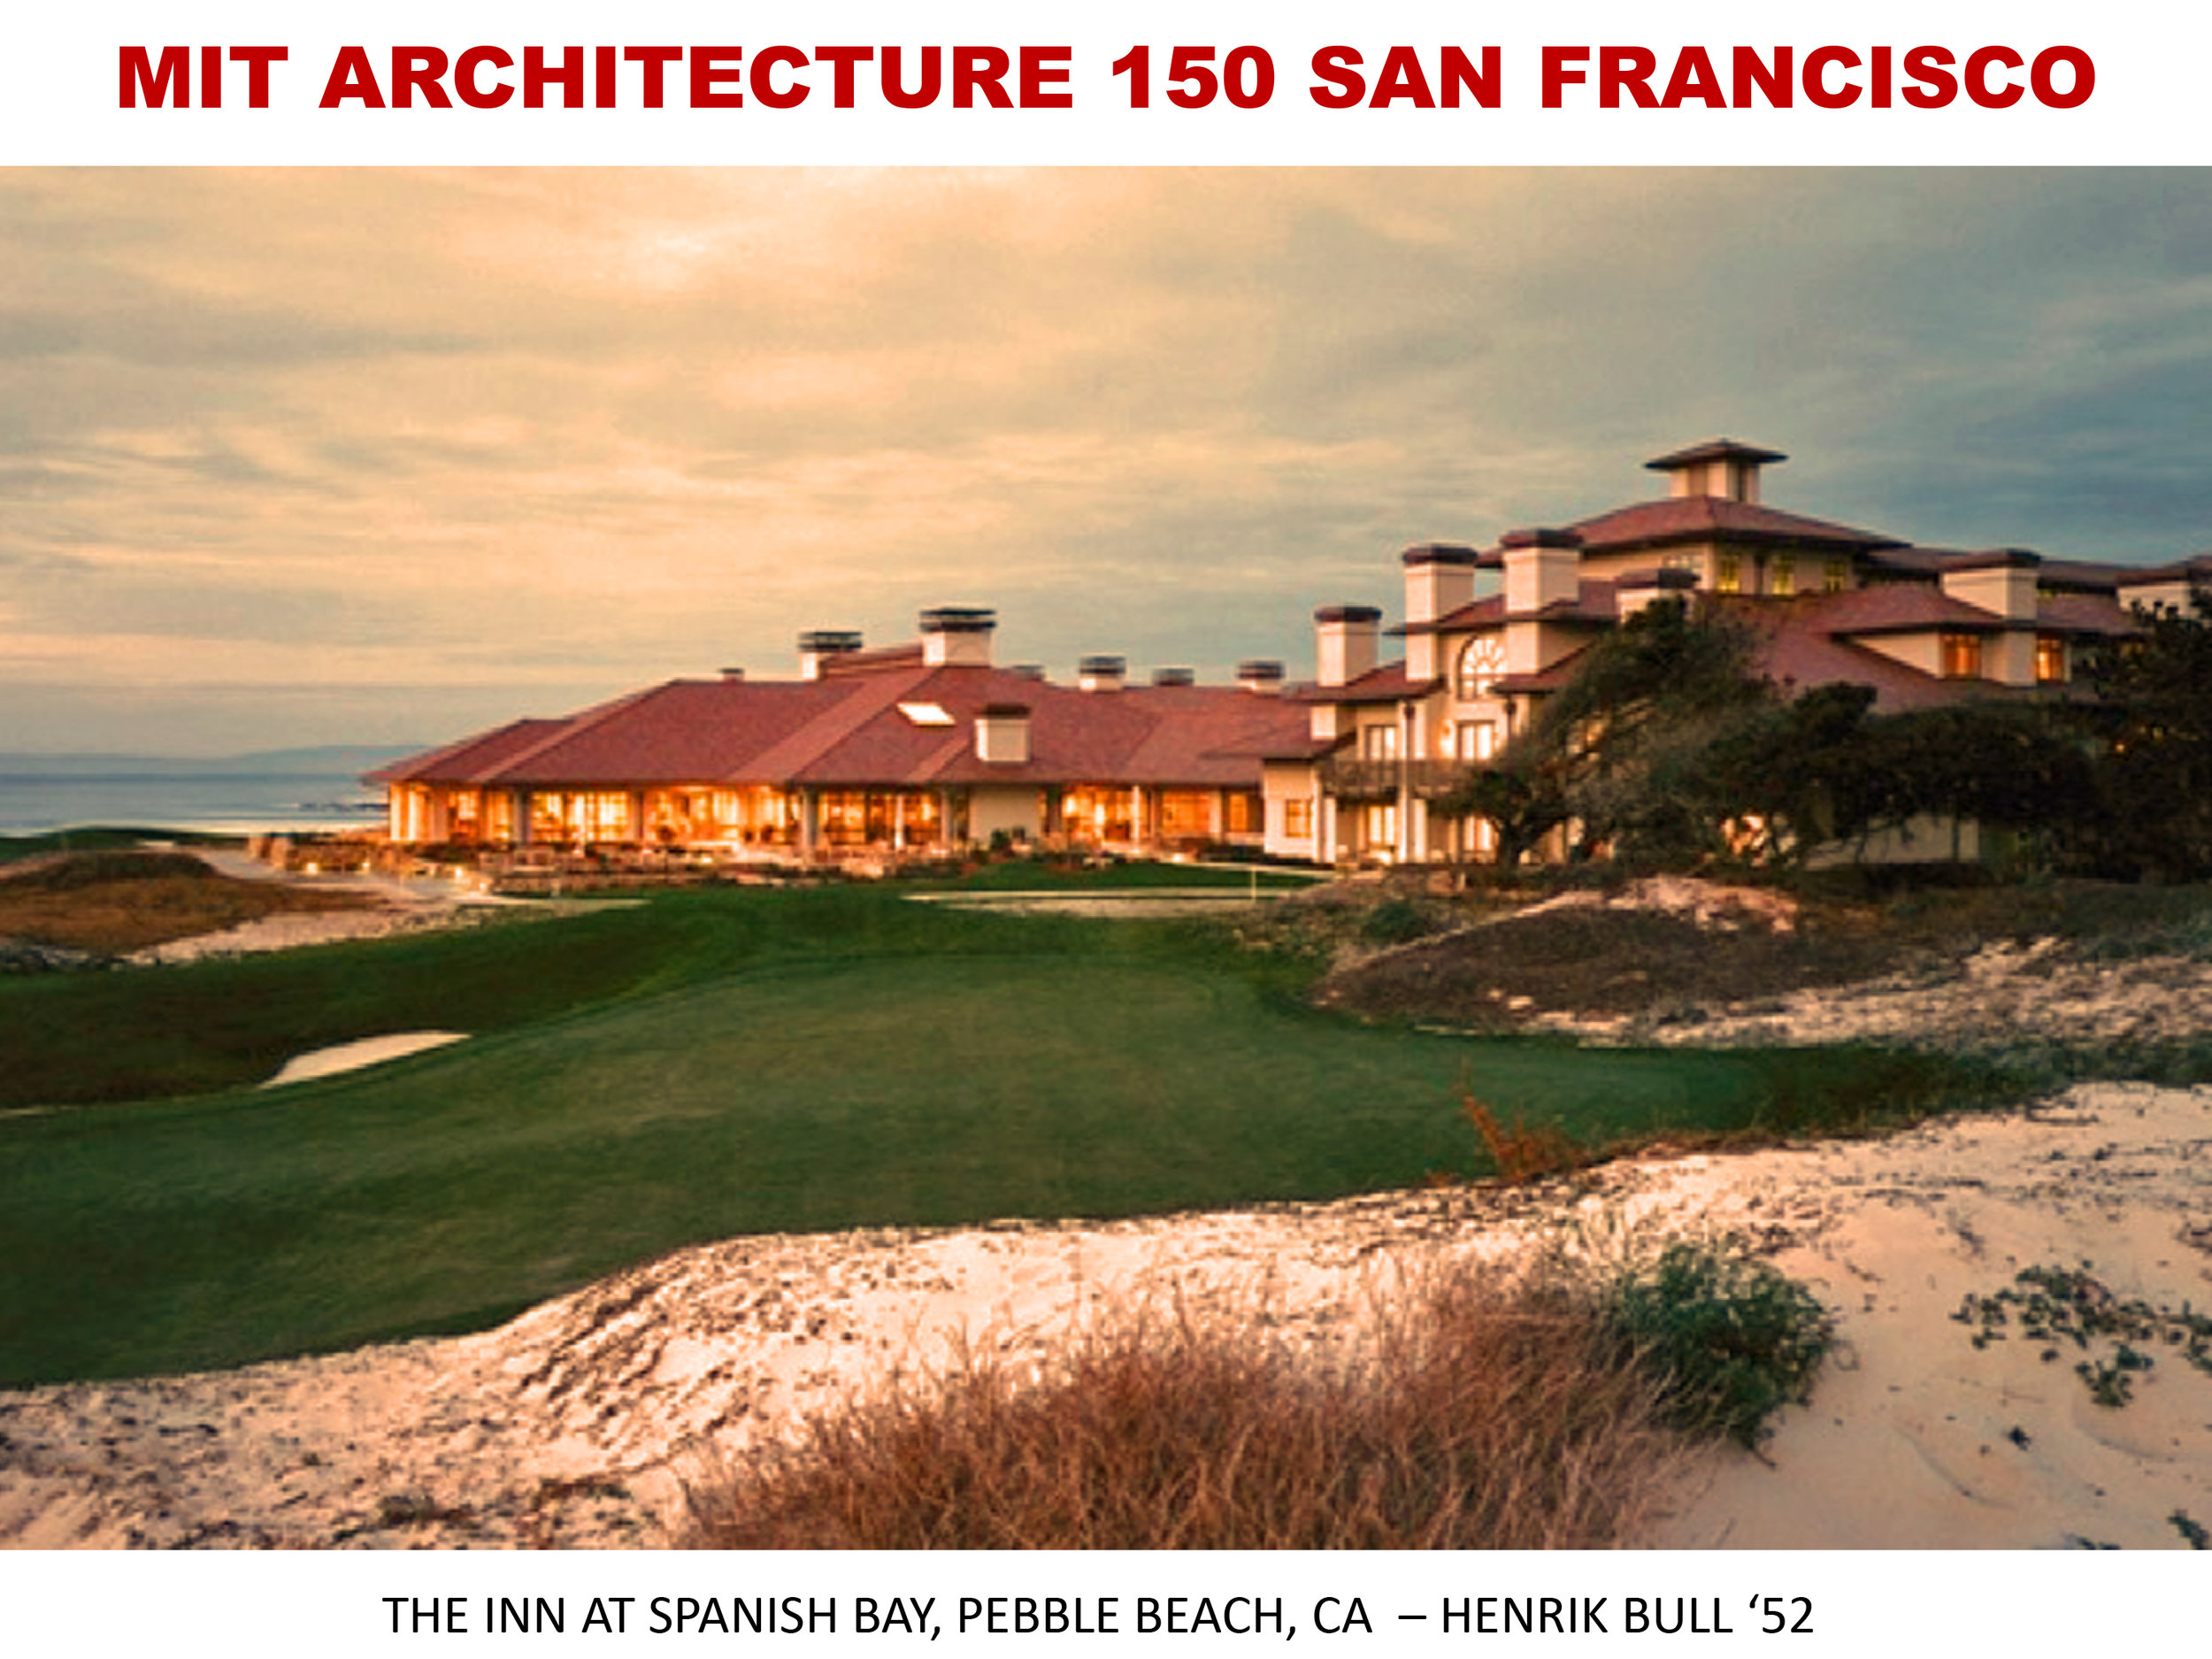 MIT ARCHITECTURE 150 SAN FRANCISCO SLIDESHOW-64 copy.jpg